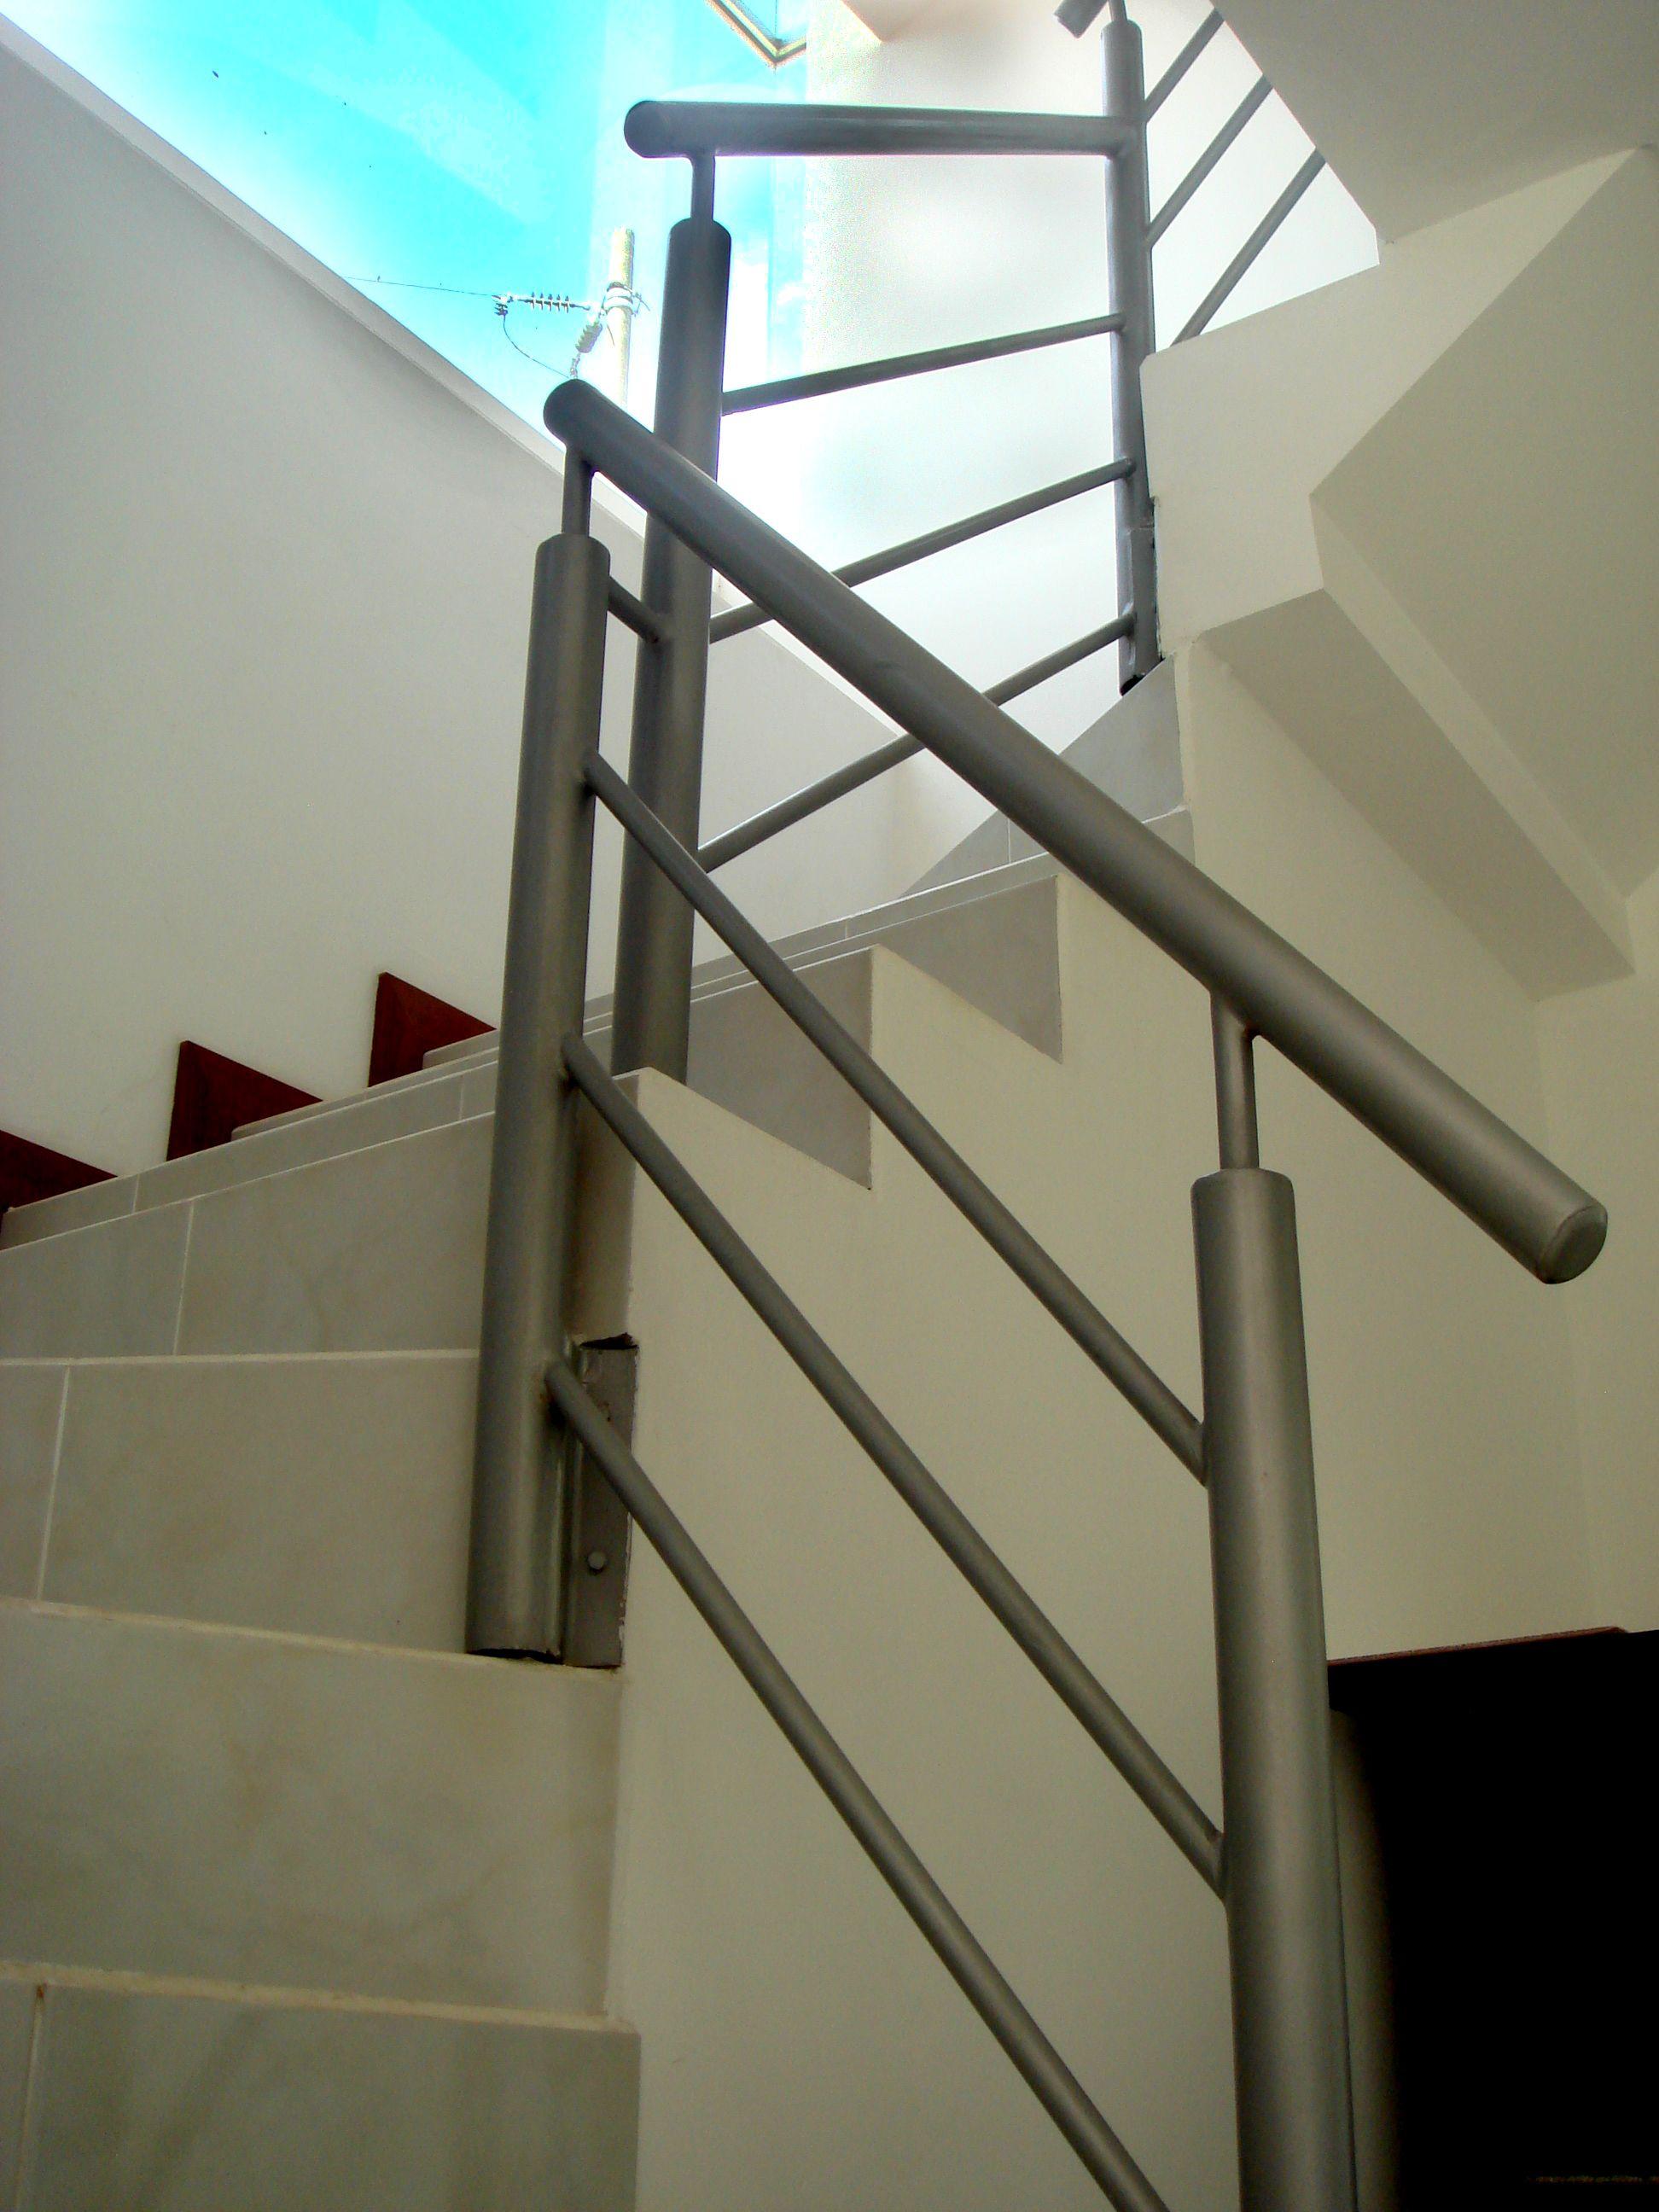 Pin de vanessa vidal en barandales de escaleras - Pasamanos de escalera ...